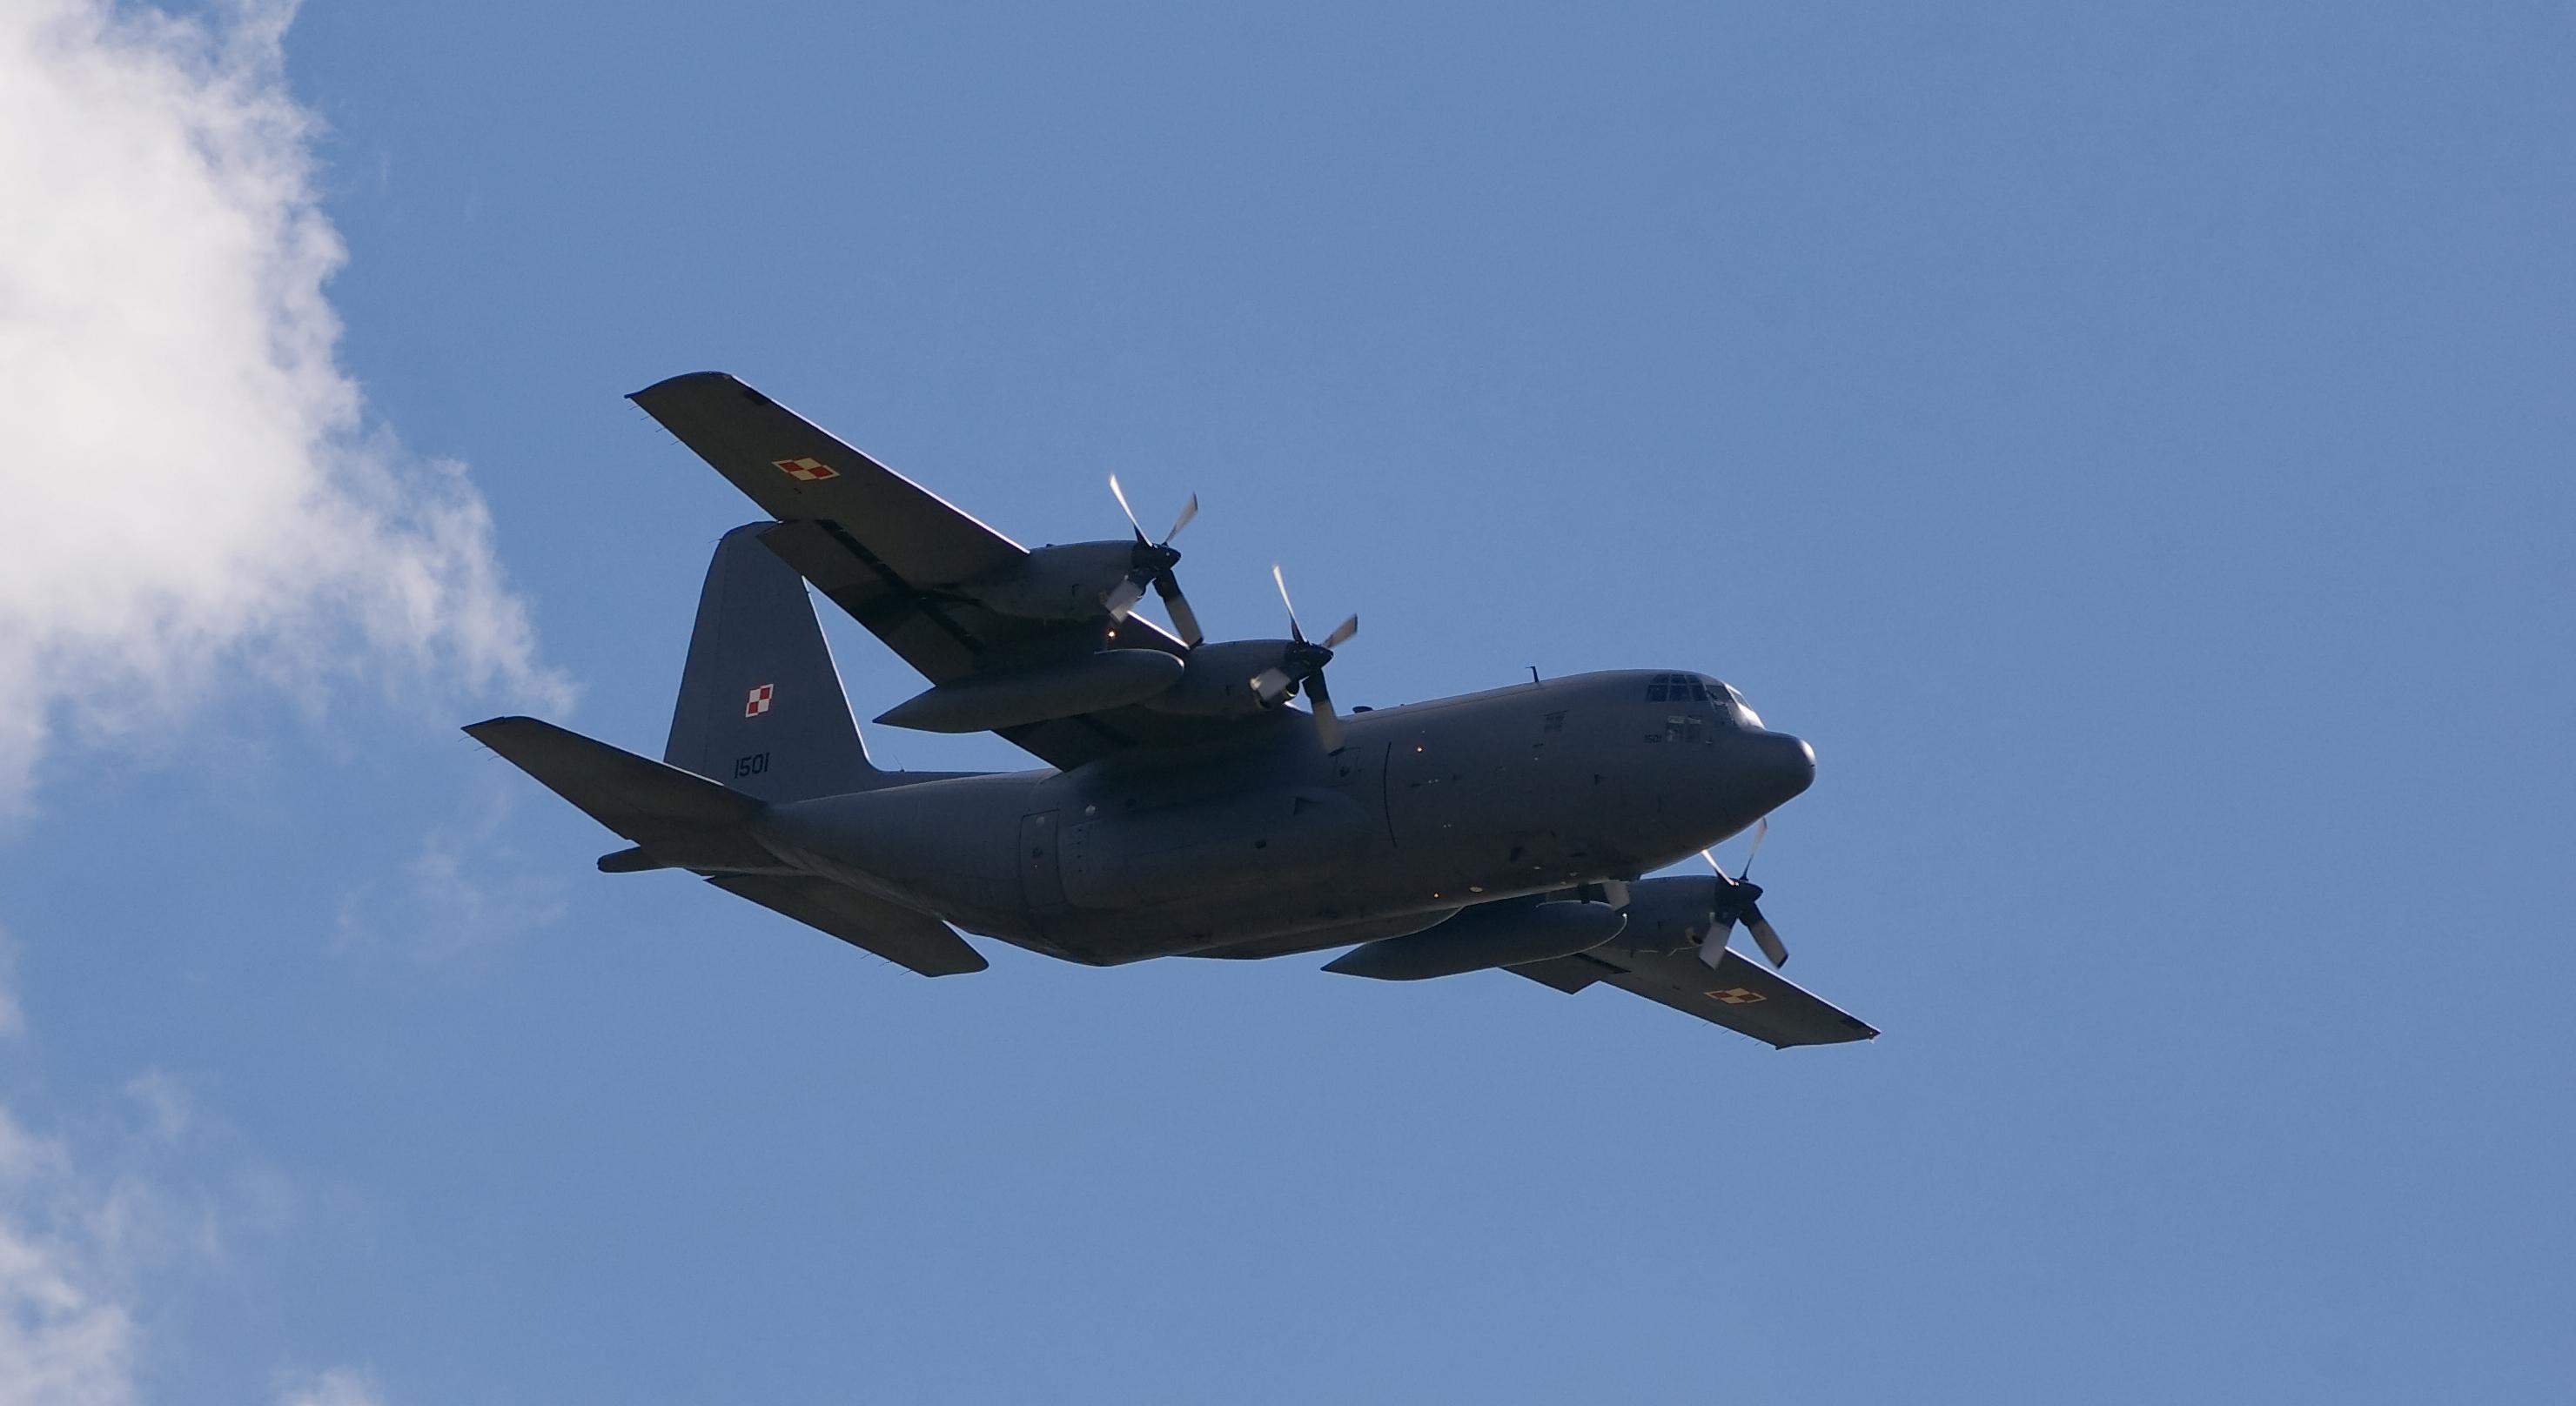 File:Polski C-130 Hercules.JPG